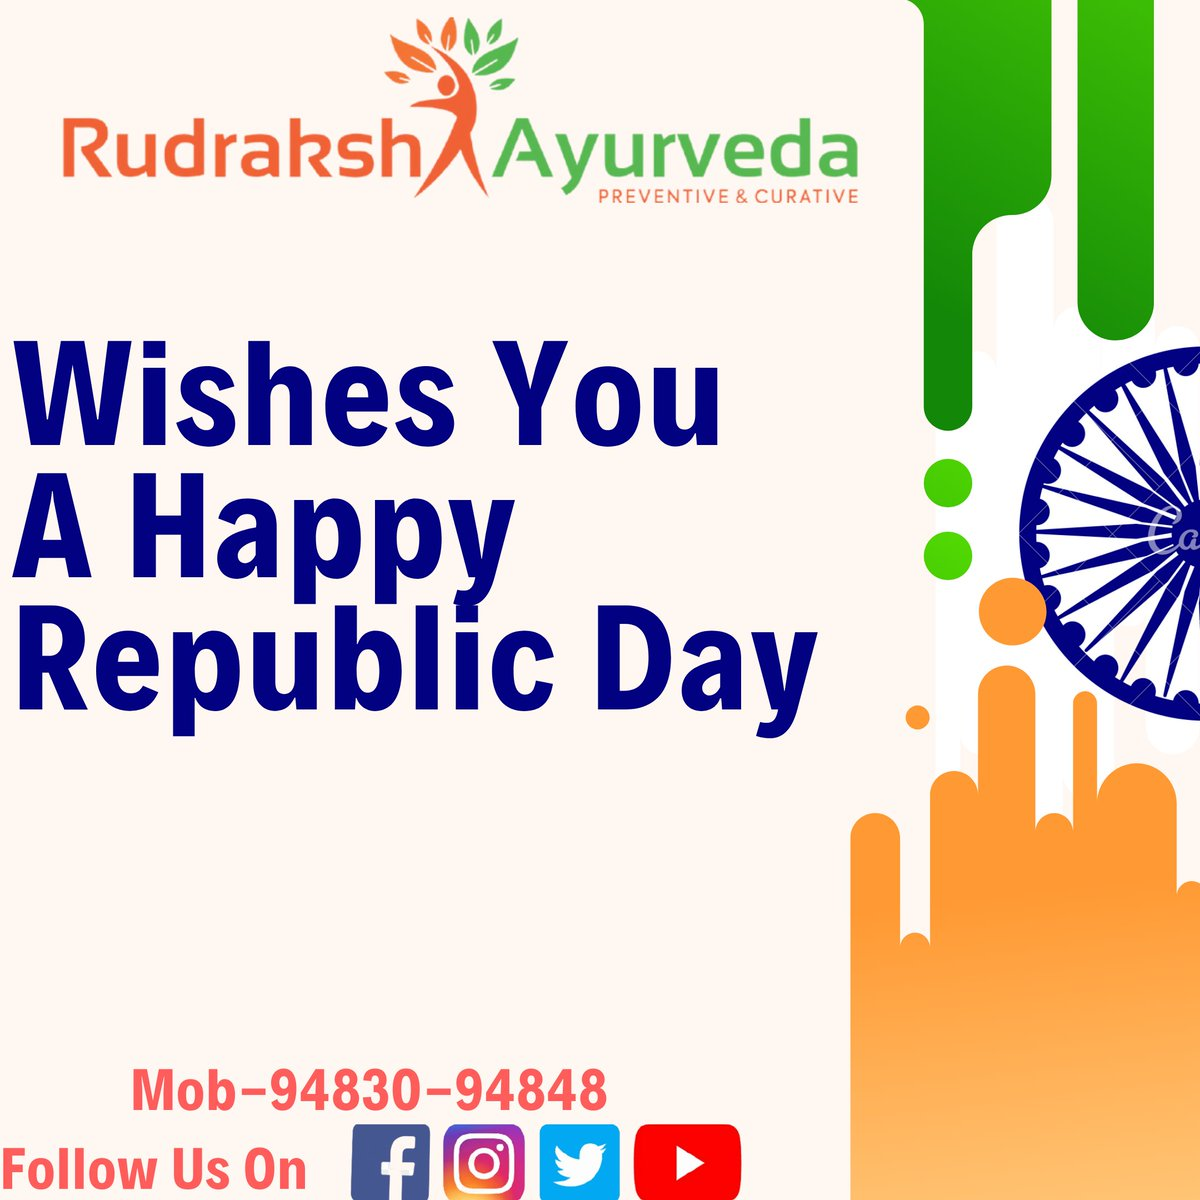 #Republic_day #Indian_republic_day #Constitution #Ambedkar #Rudraksh_Ayurveda #Ayurveda #Health #Healthy #Natural #Ballari #Bellary #Prventive #Curative #Mental_Health #Mindset #Positive_Shift #Organic #Garbha_Sanskara #Professional_Preventive_Health #Walk_and_drink #Healthy https://t.co/RaWL9684H1